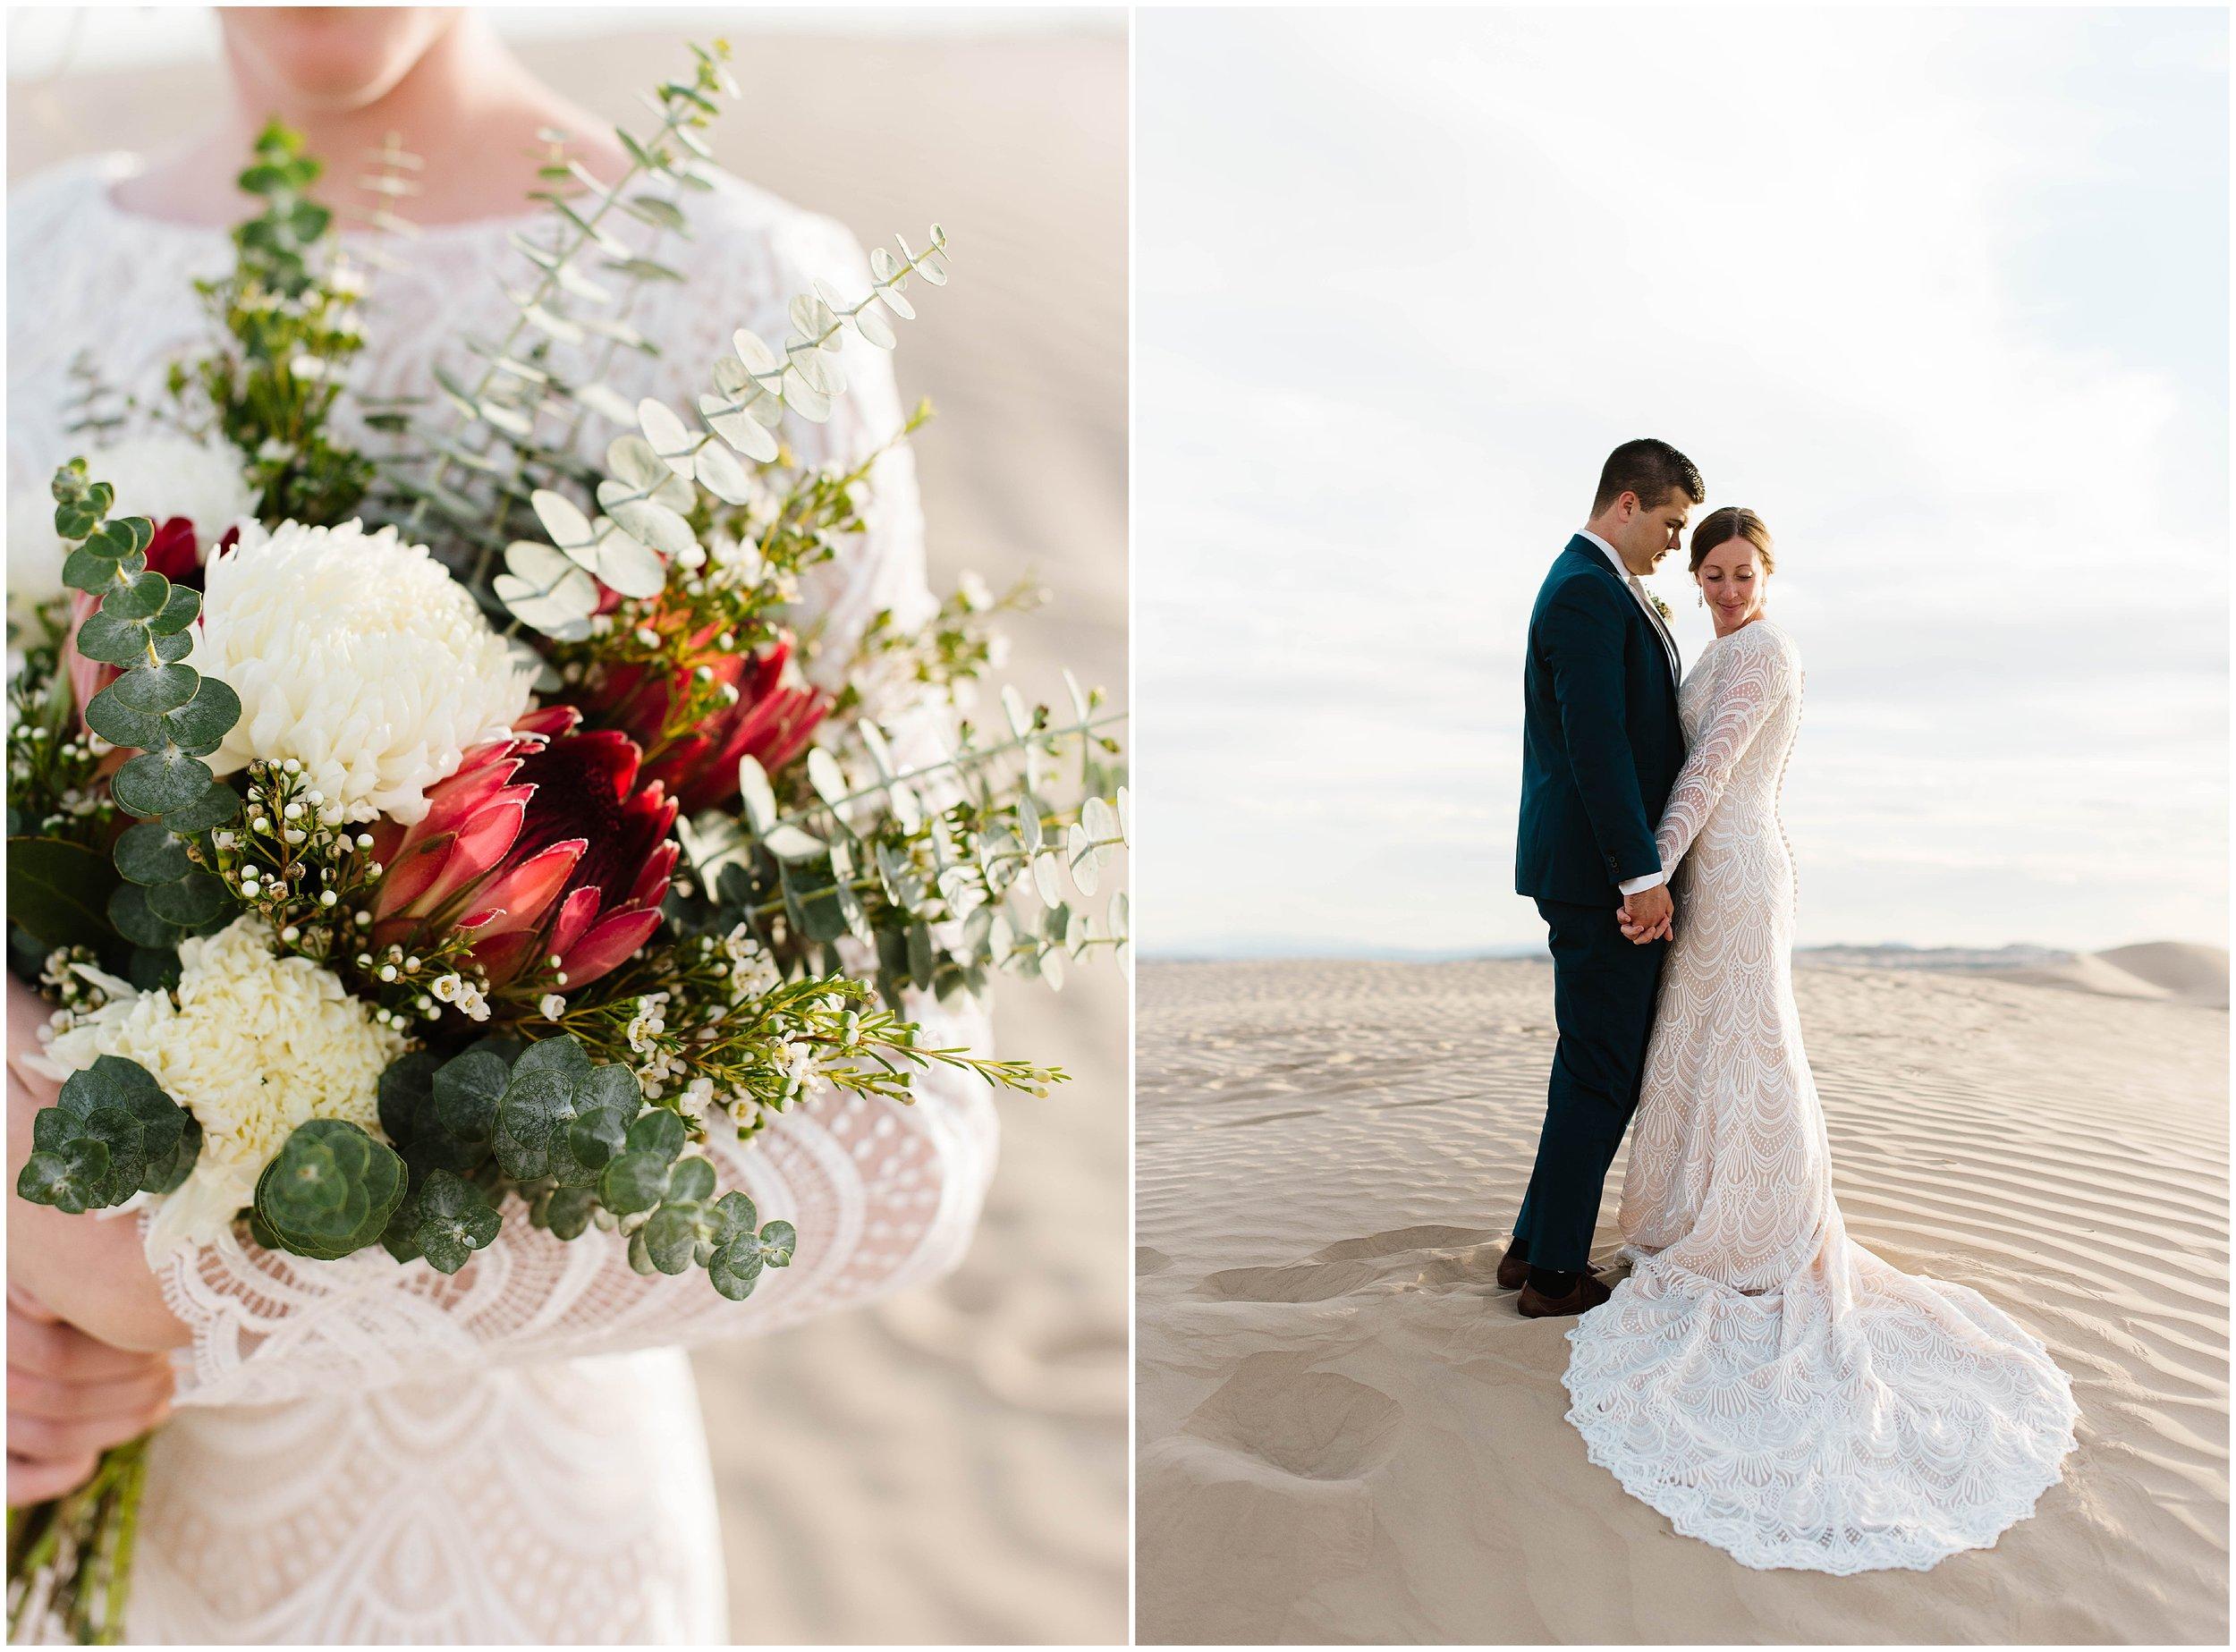 little-sahara-sand-dunes-wedding-amber-lynne-photography.jpg8.jpg